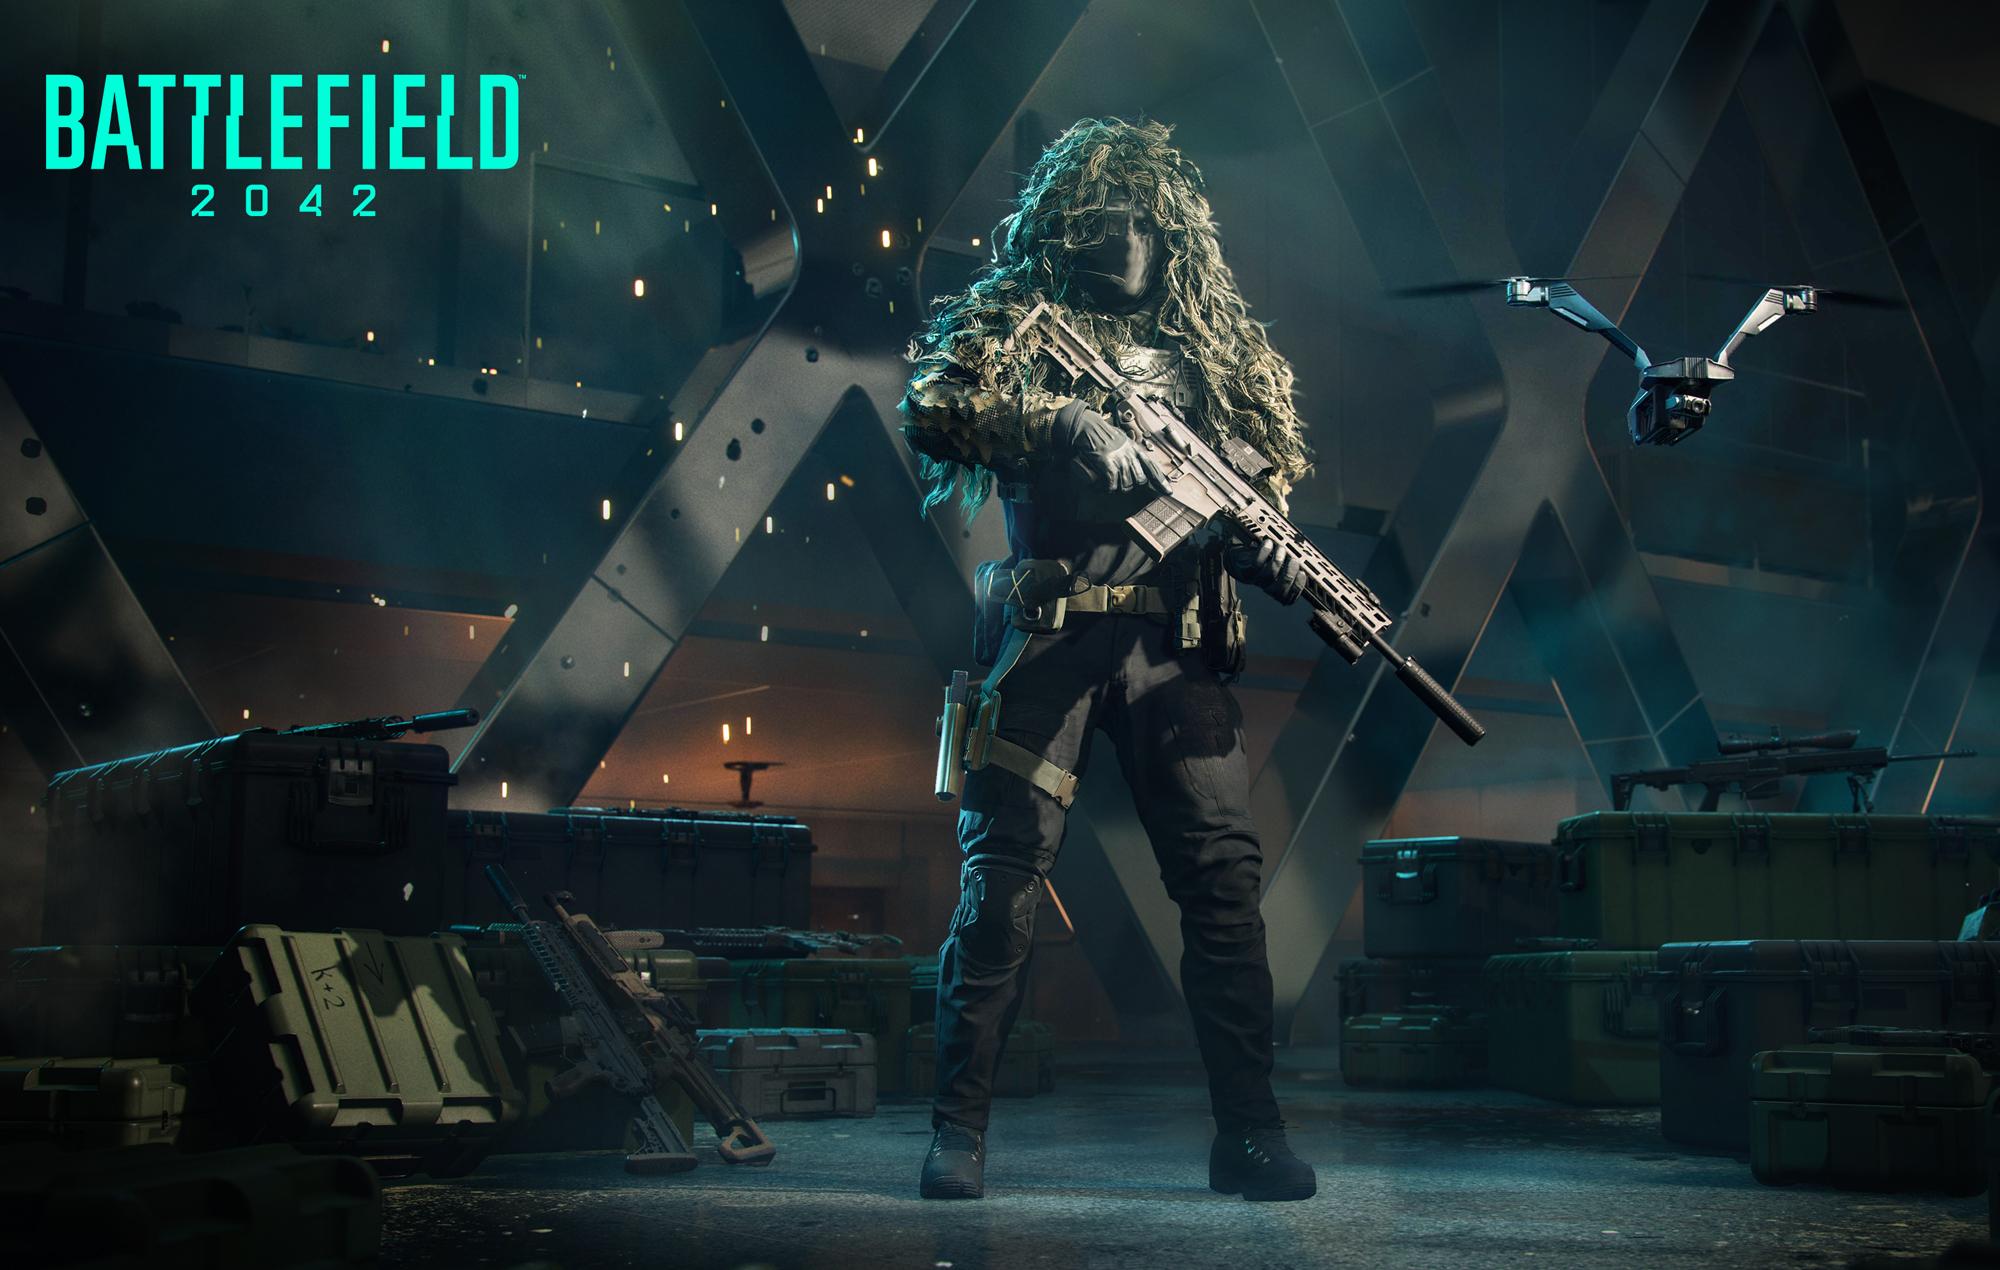 Battlefield 2042 beta will come next week